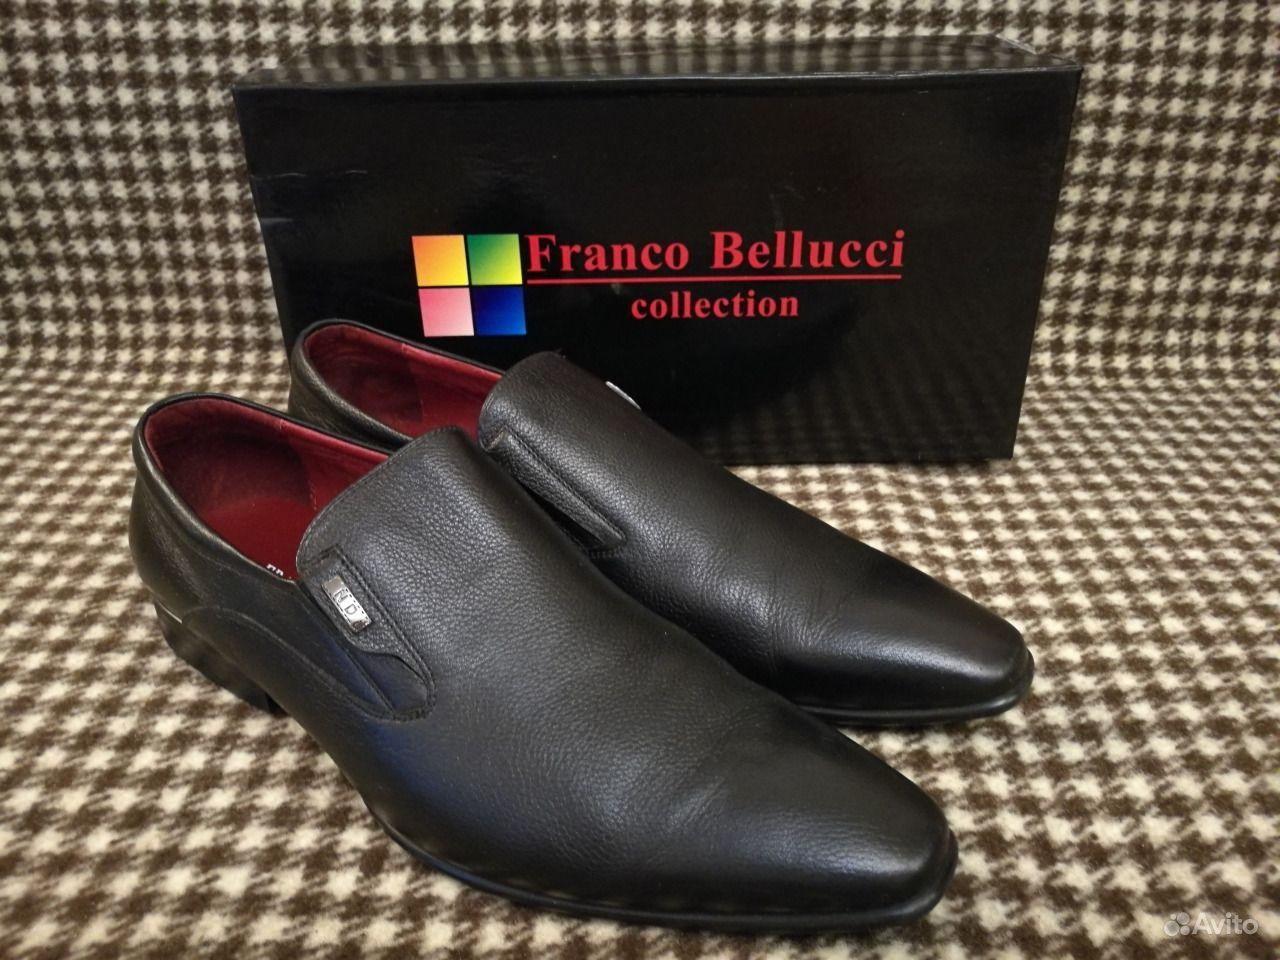 c2fb07ddb011 Мужские туфли franko bellucci   Festima.Ru - Мониторинг объявлений